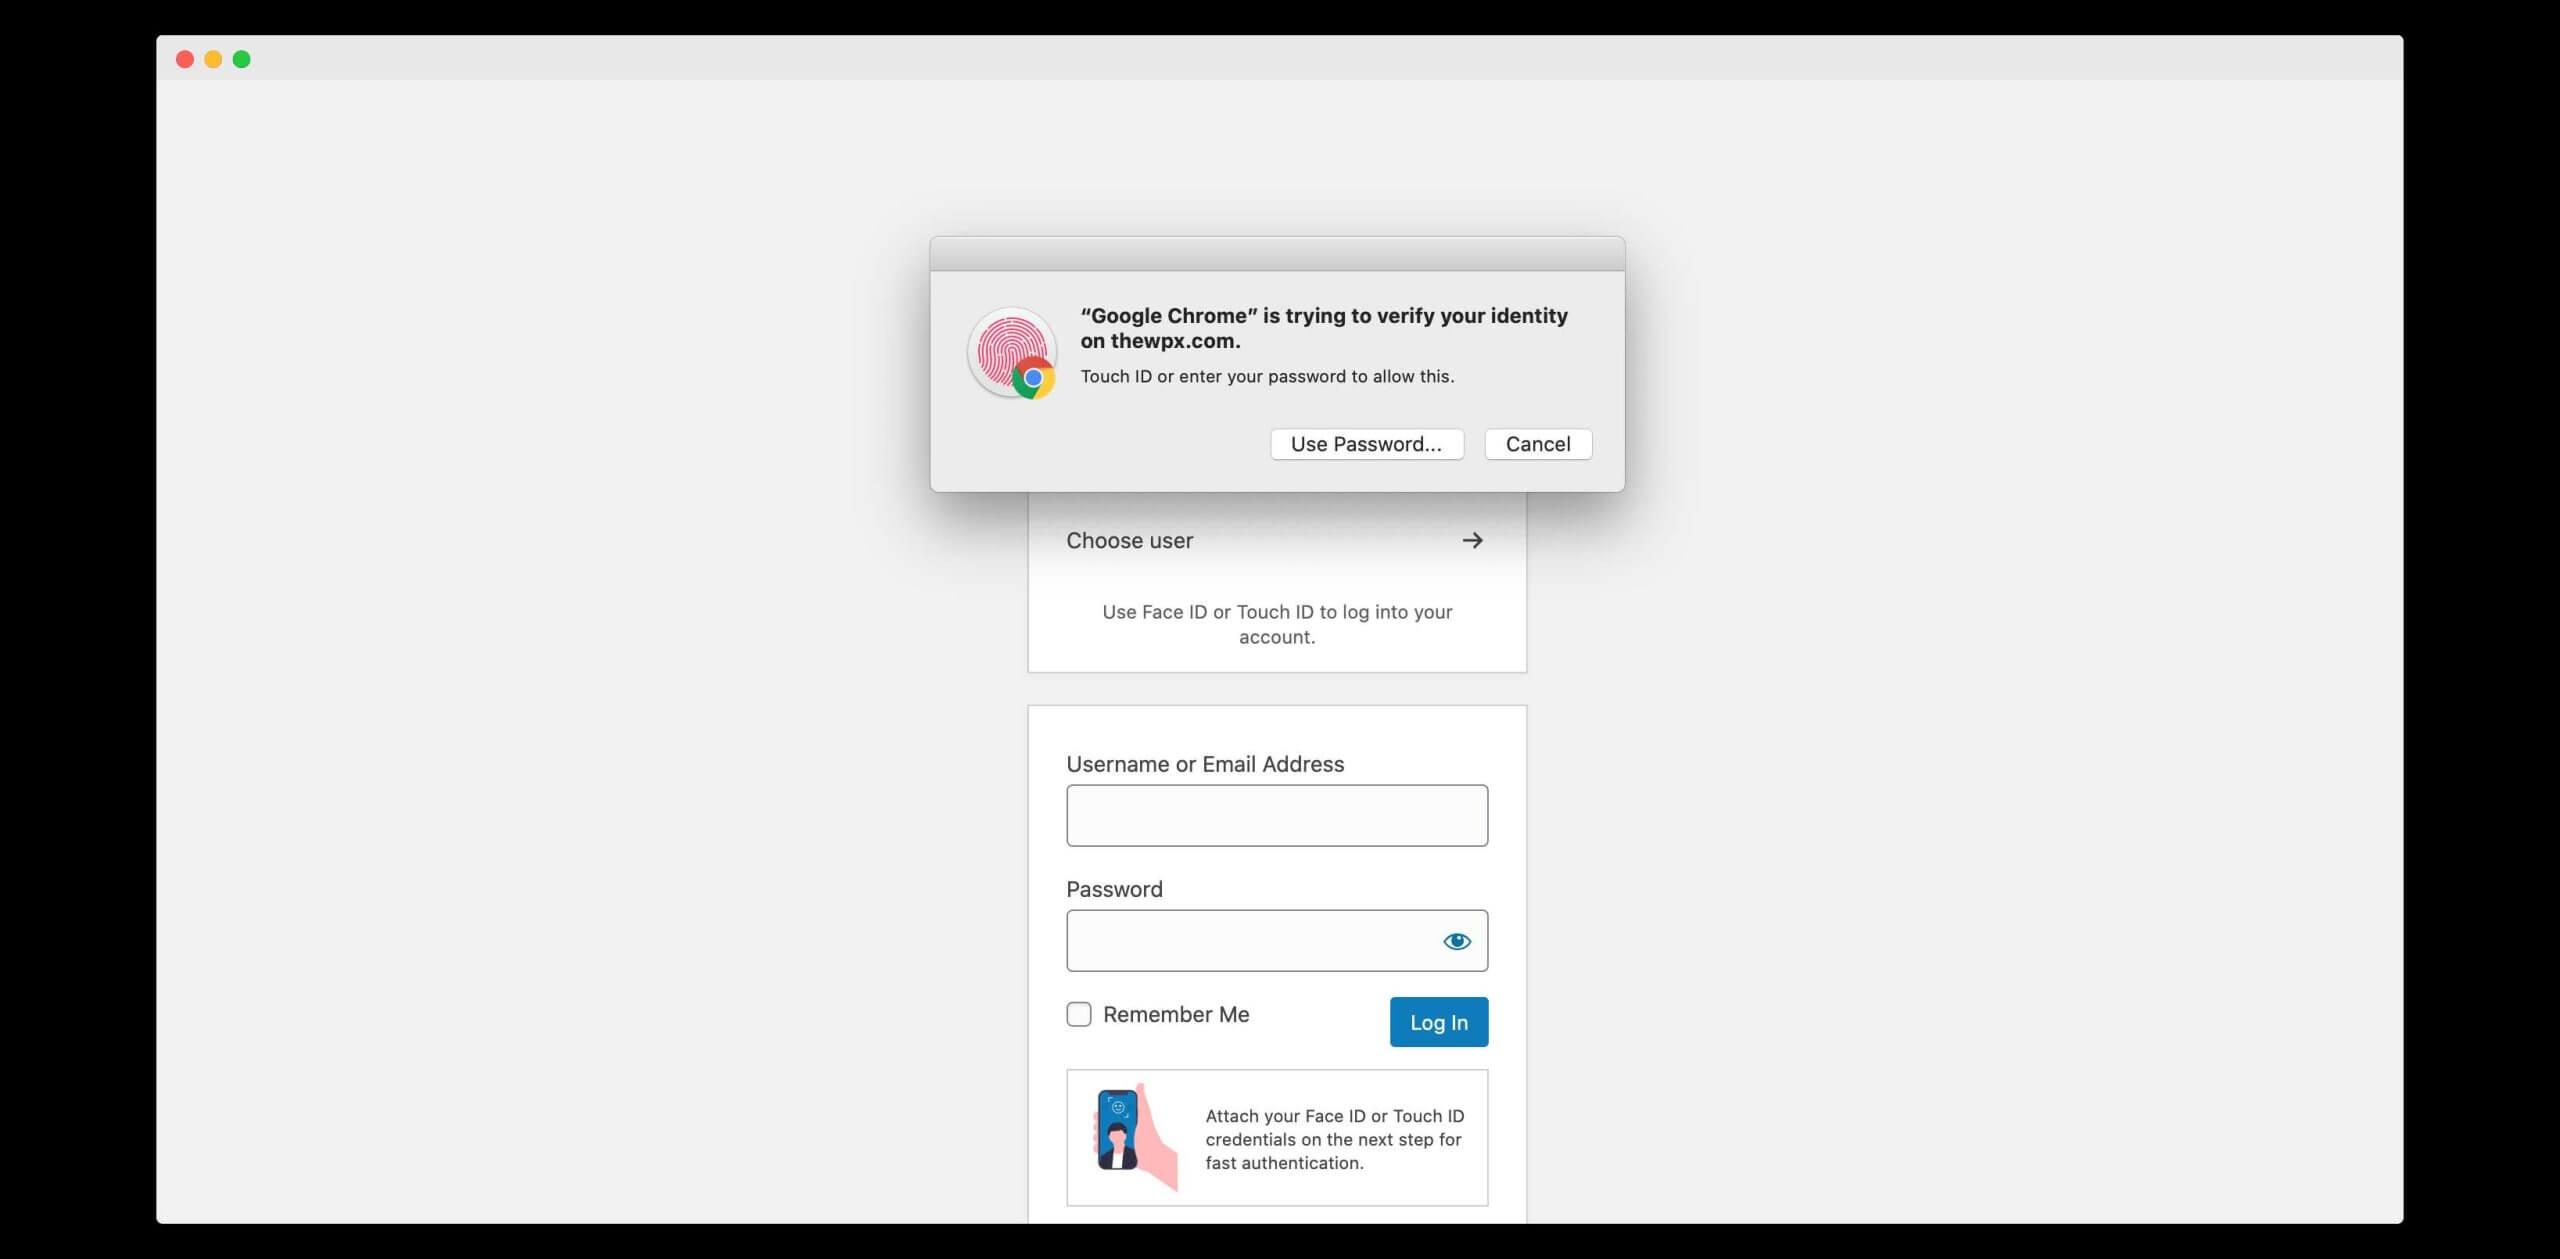 passwordless login in wordpress using touch id